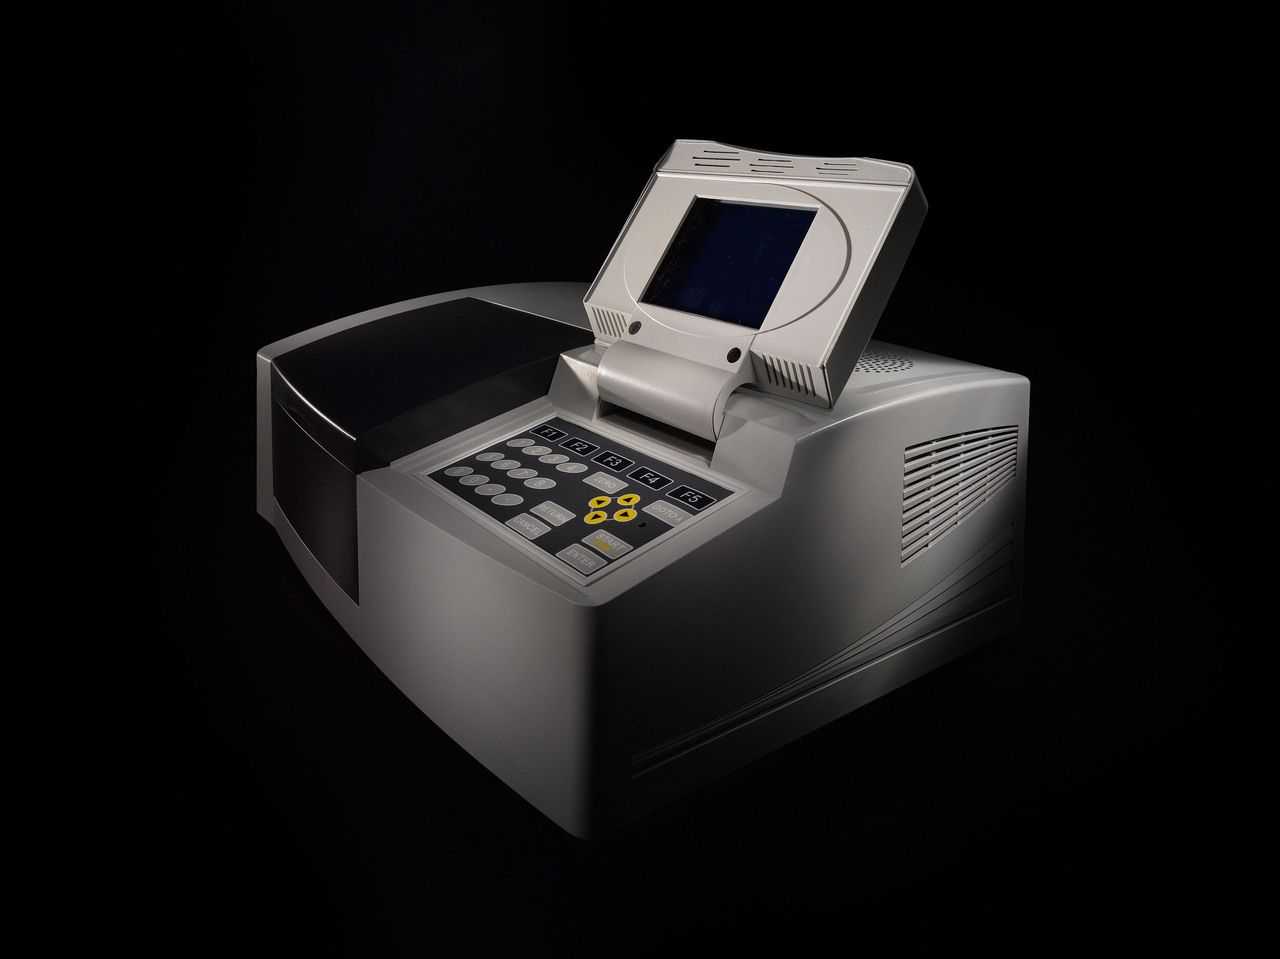 Espectrofotômetro UV-VIS automático, mono feixe,com visor gráfico, comprimento de onda de 190 a 1100 nm, banda variável de 0,5/1,0/2,0/5,0. Modelo T7S